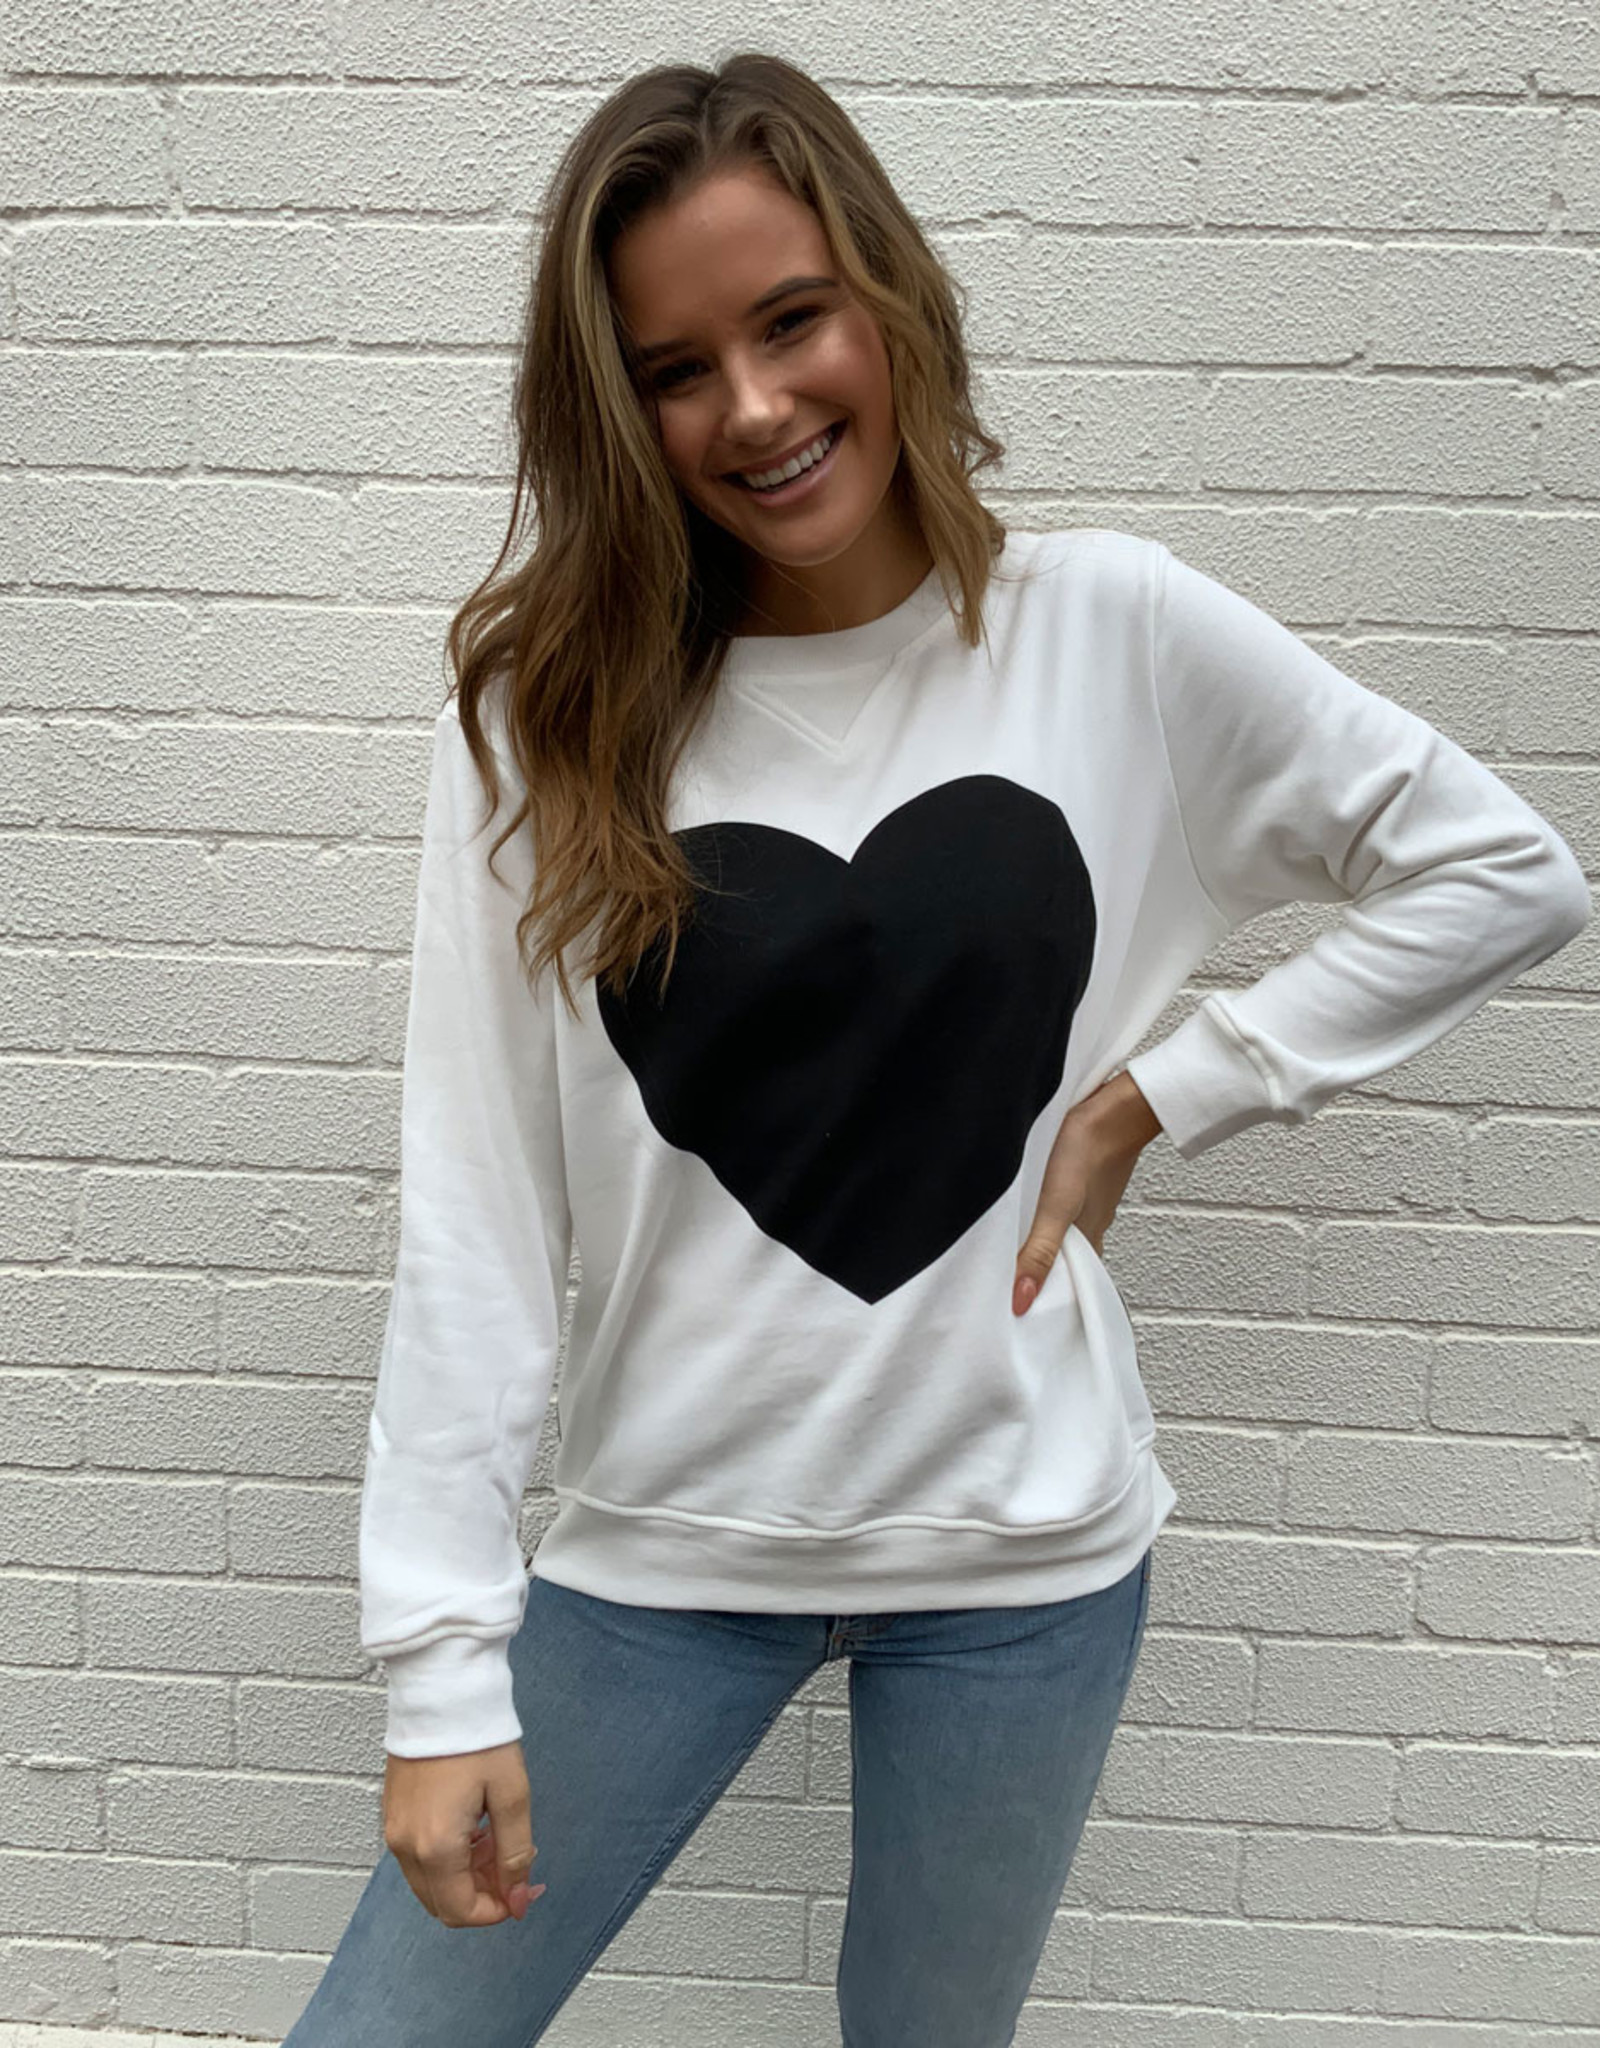 SOPHIE MORAN ZIP SWEATSHIRT WINTER WHITE & BLACK HEART